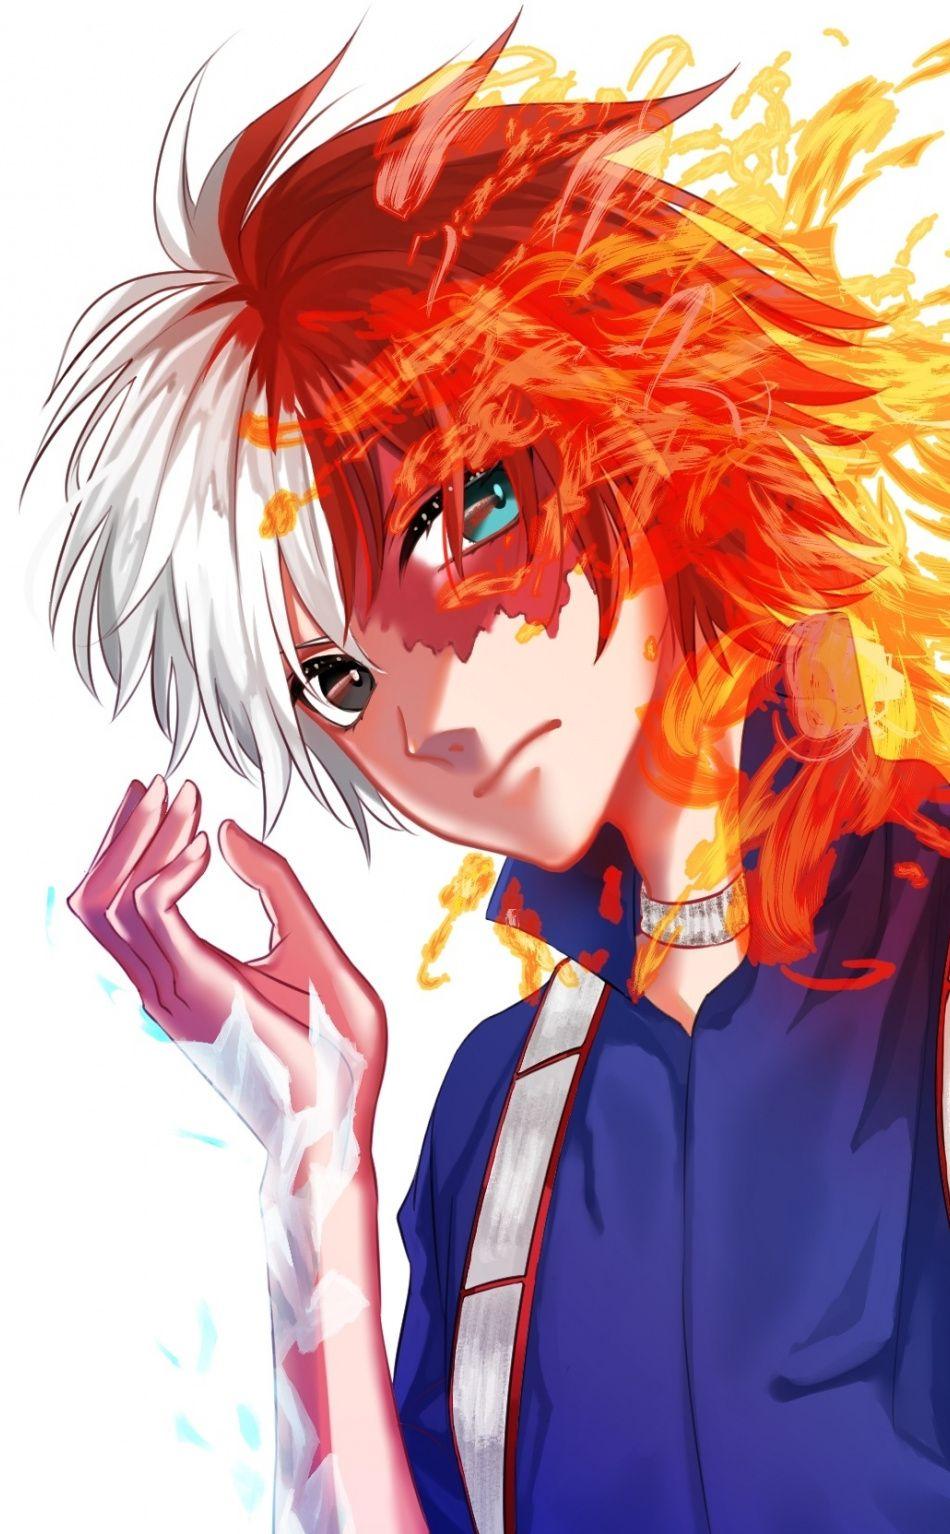 Anime Boy Artwork Shoto Todoroki 950x1534 Wallpaper Anime Boy Anime Boys Artwork